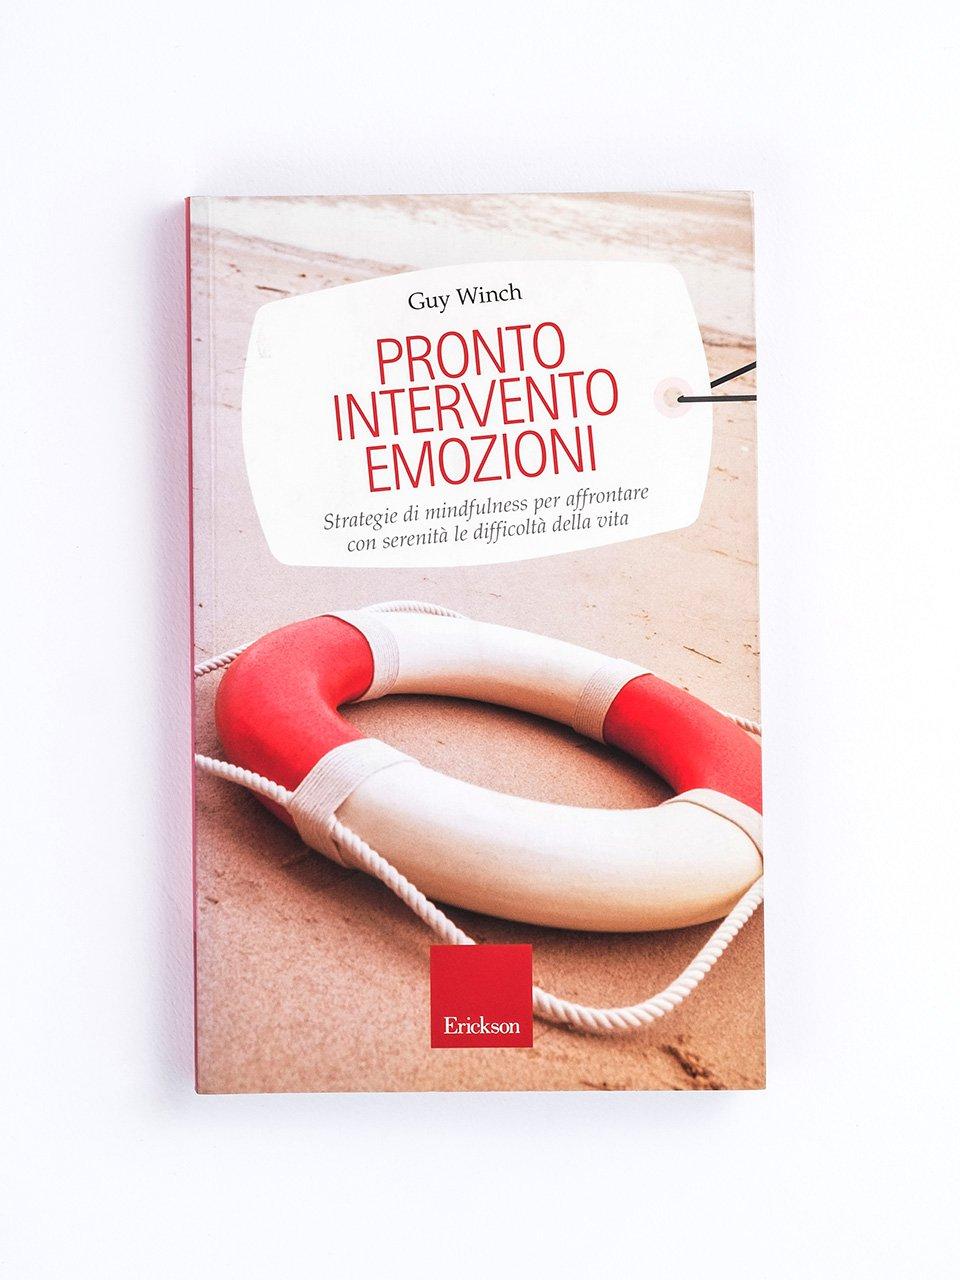 Pronto intervento emozioni - Libri - Erickson